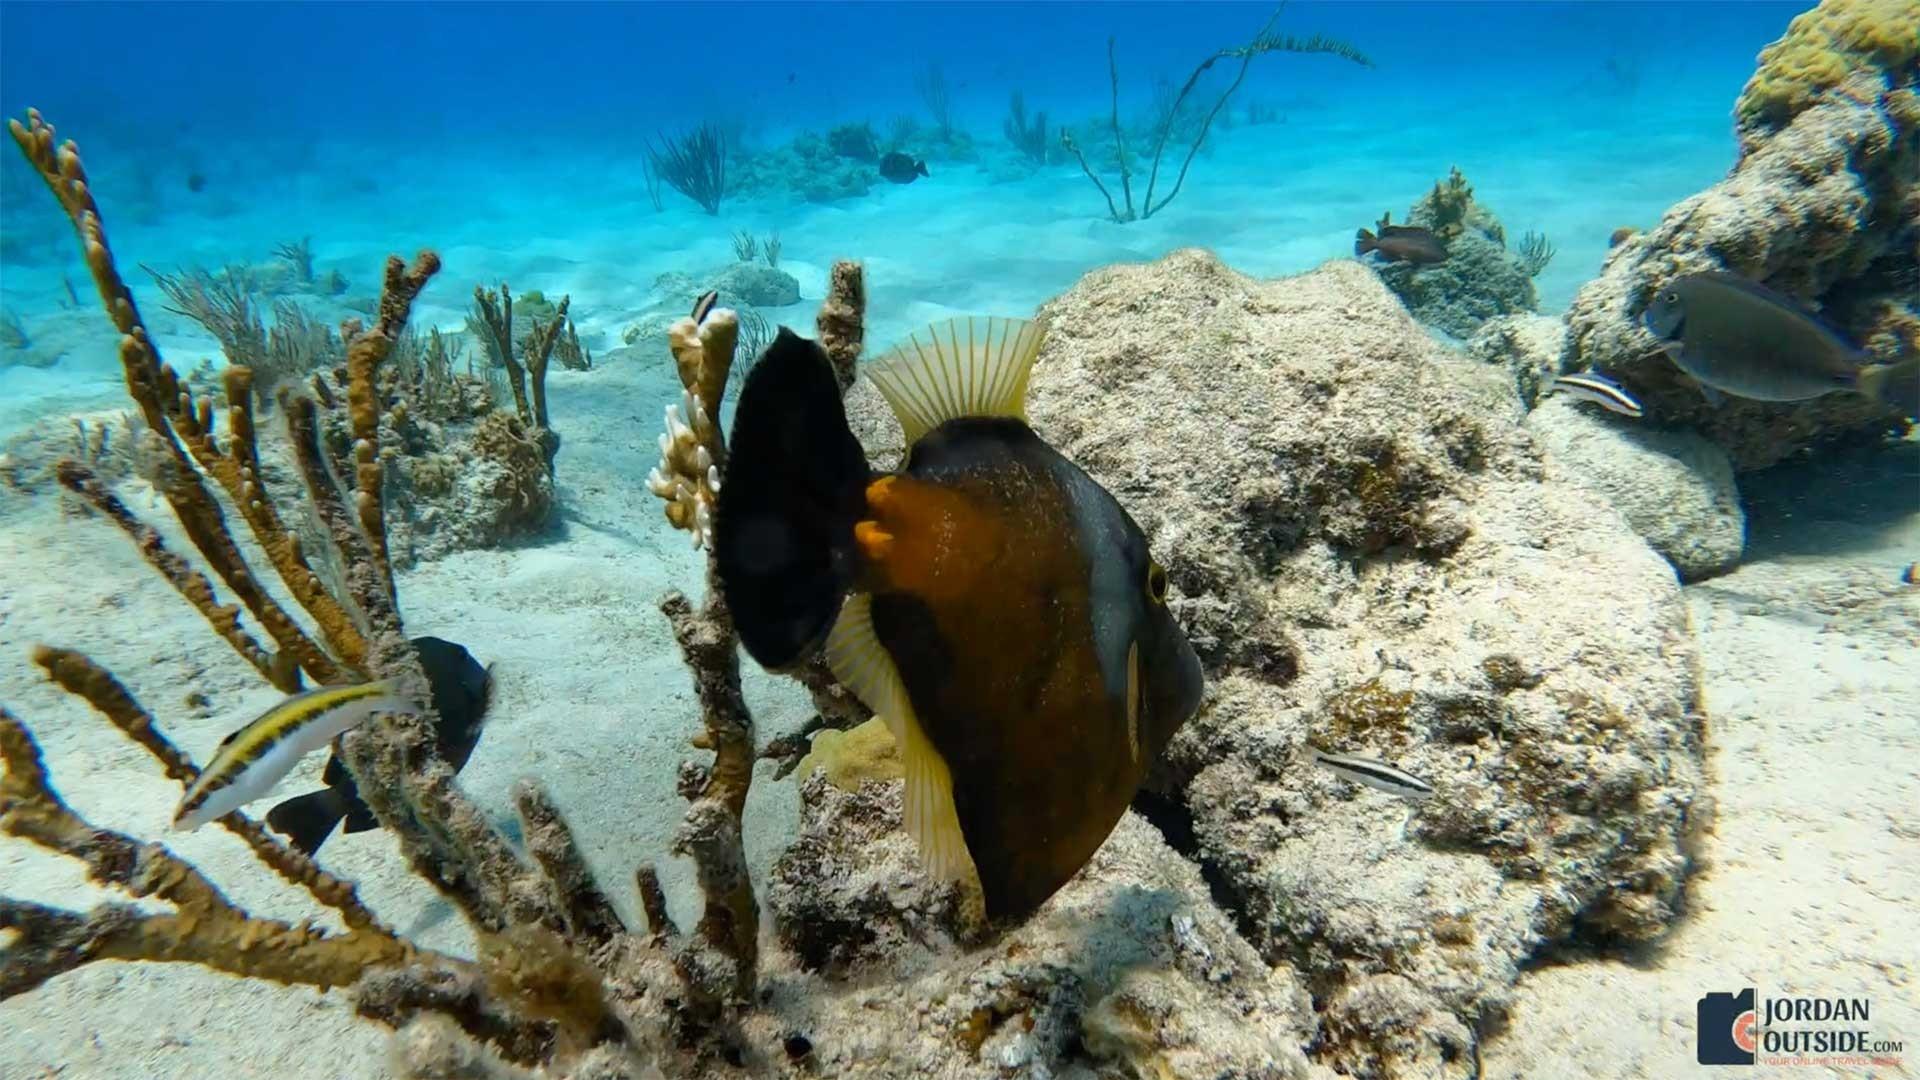 Fish at Cane Bay, St. Croix